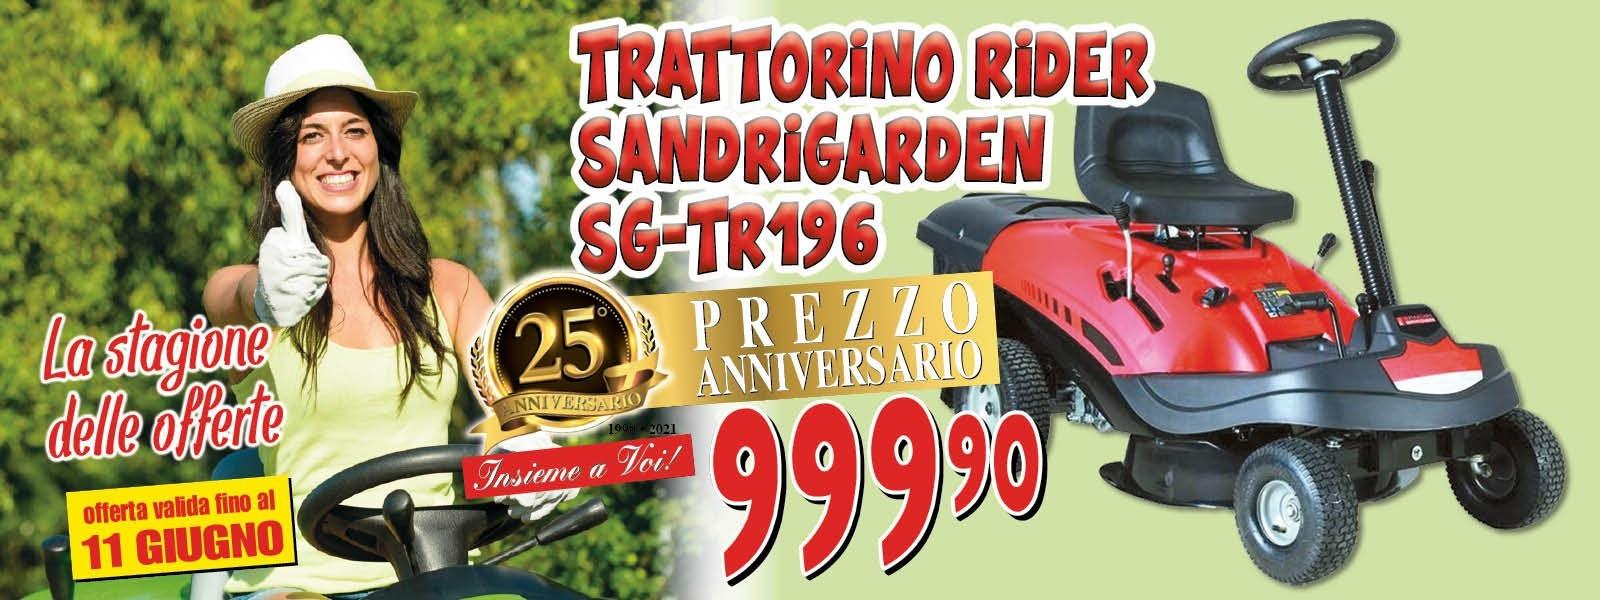 trattorino rider sandri garden